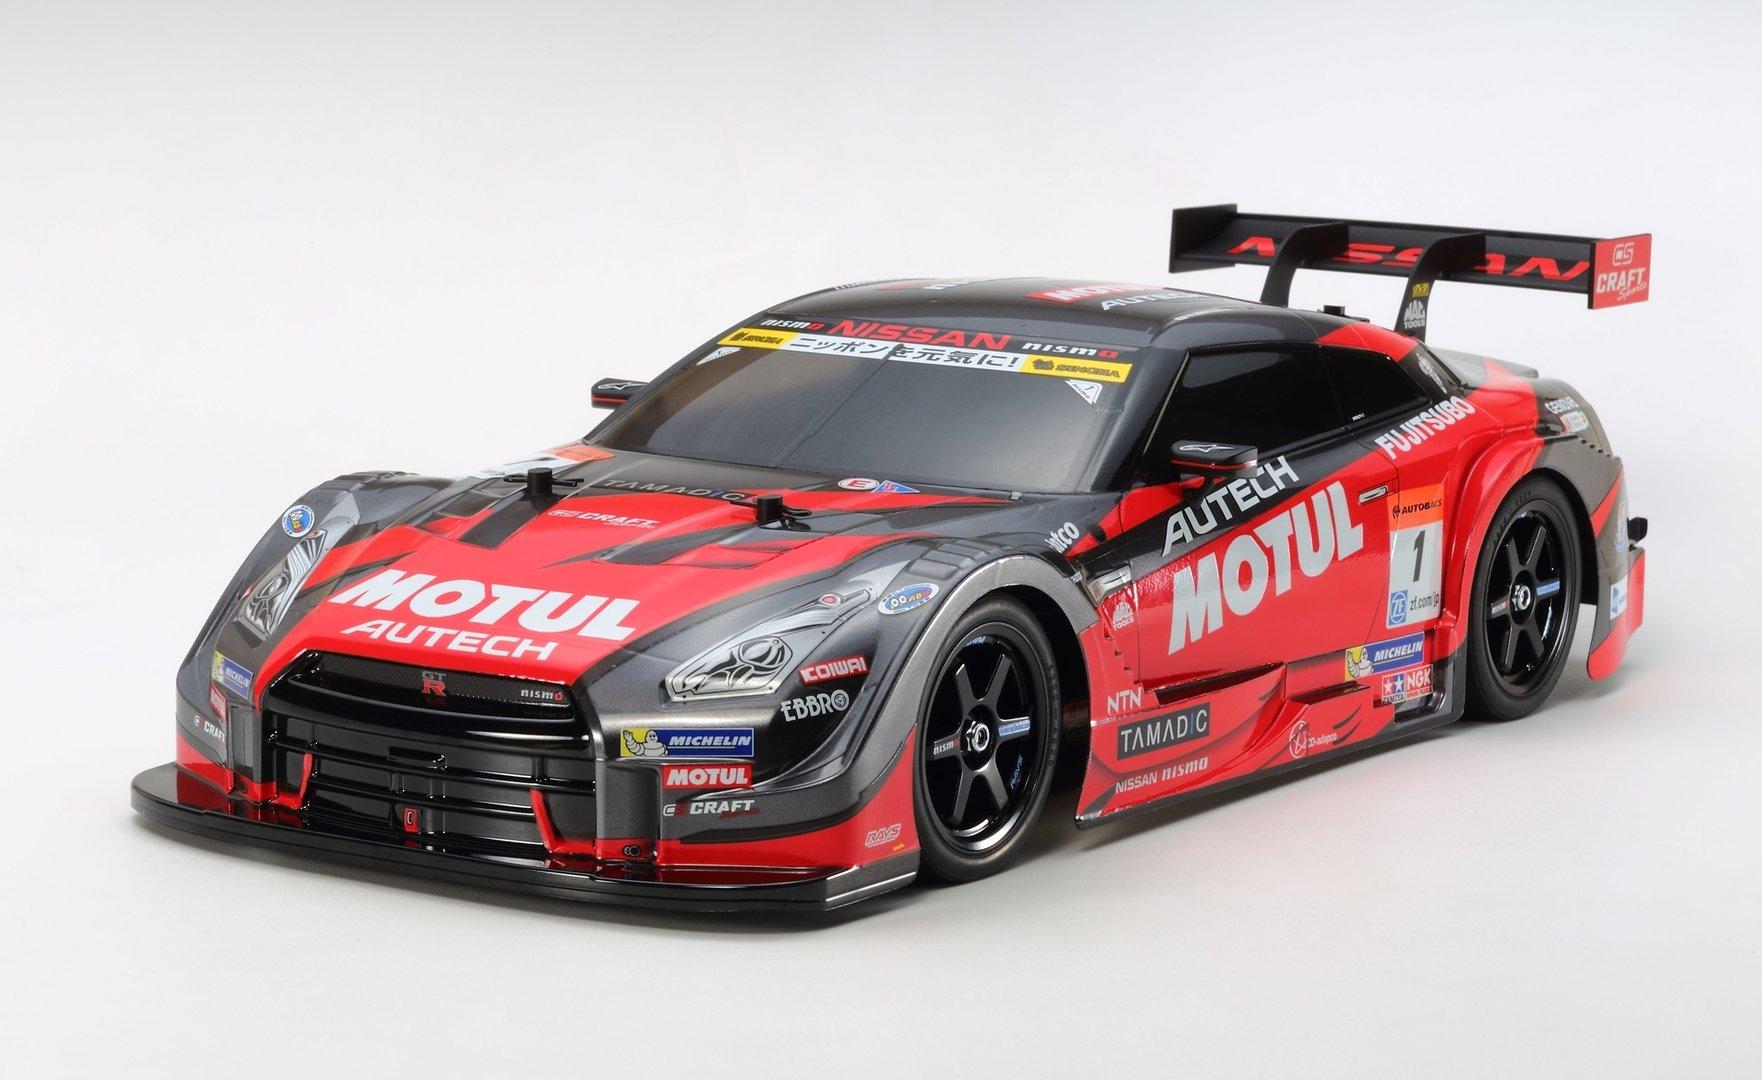 [RC-KleinKram] Tamiya TT-02 Roller - Motul Autech Nissan Nismo GT-R - 1:10